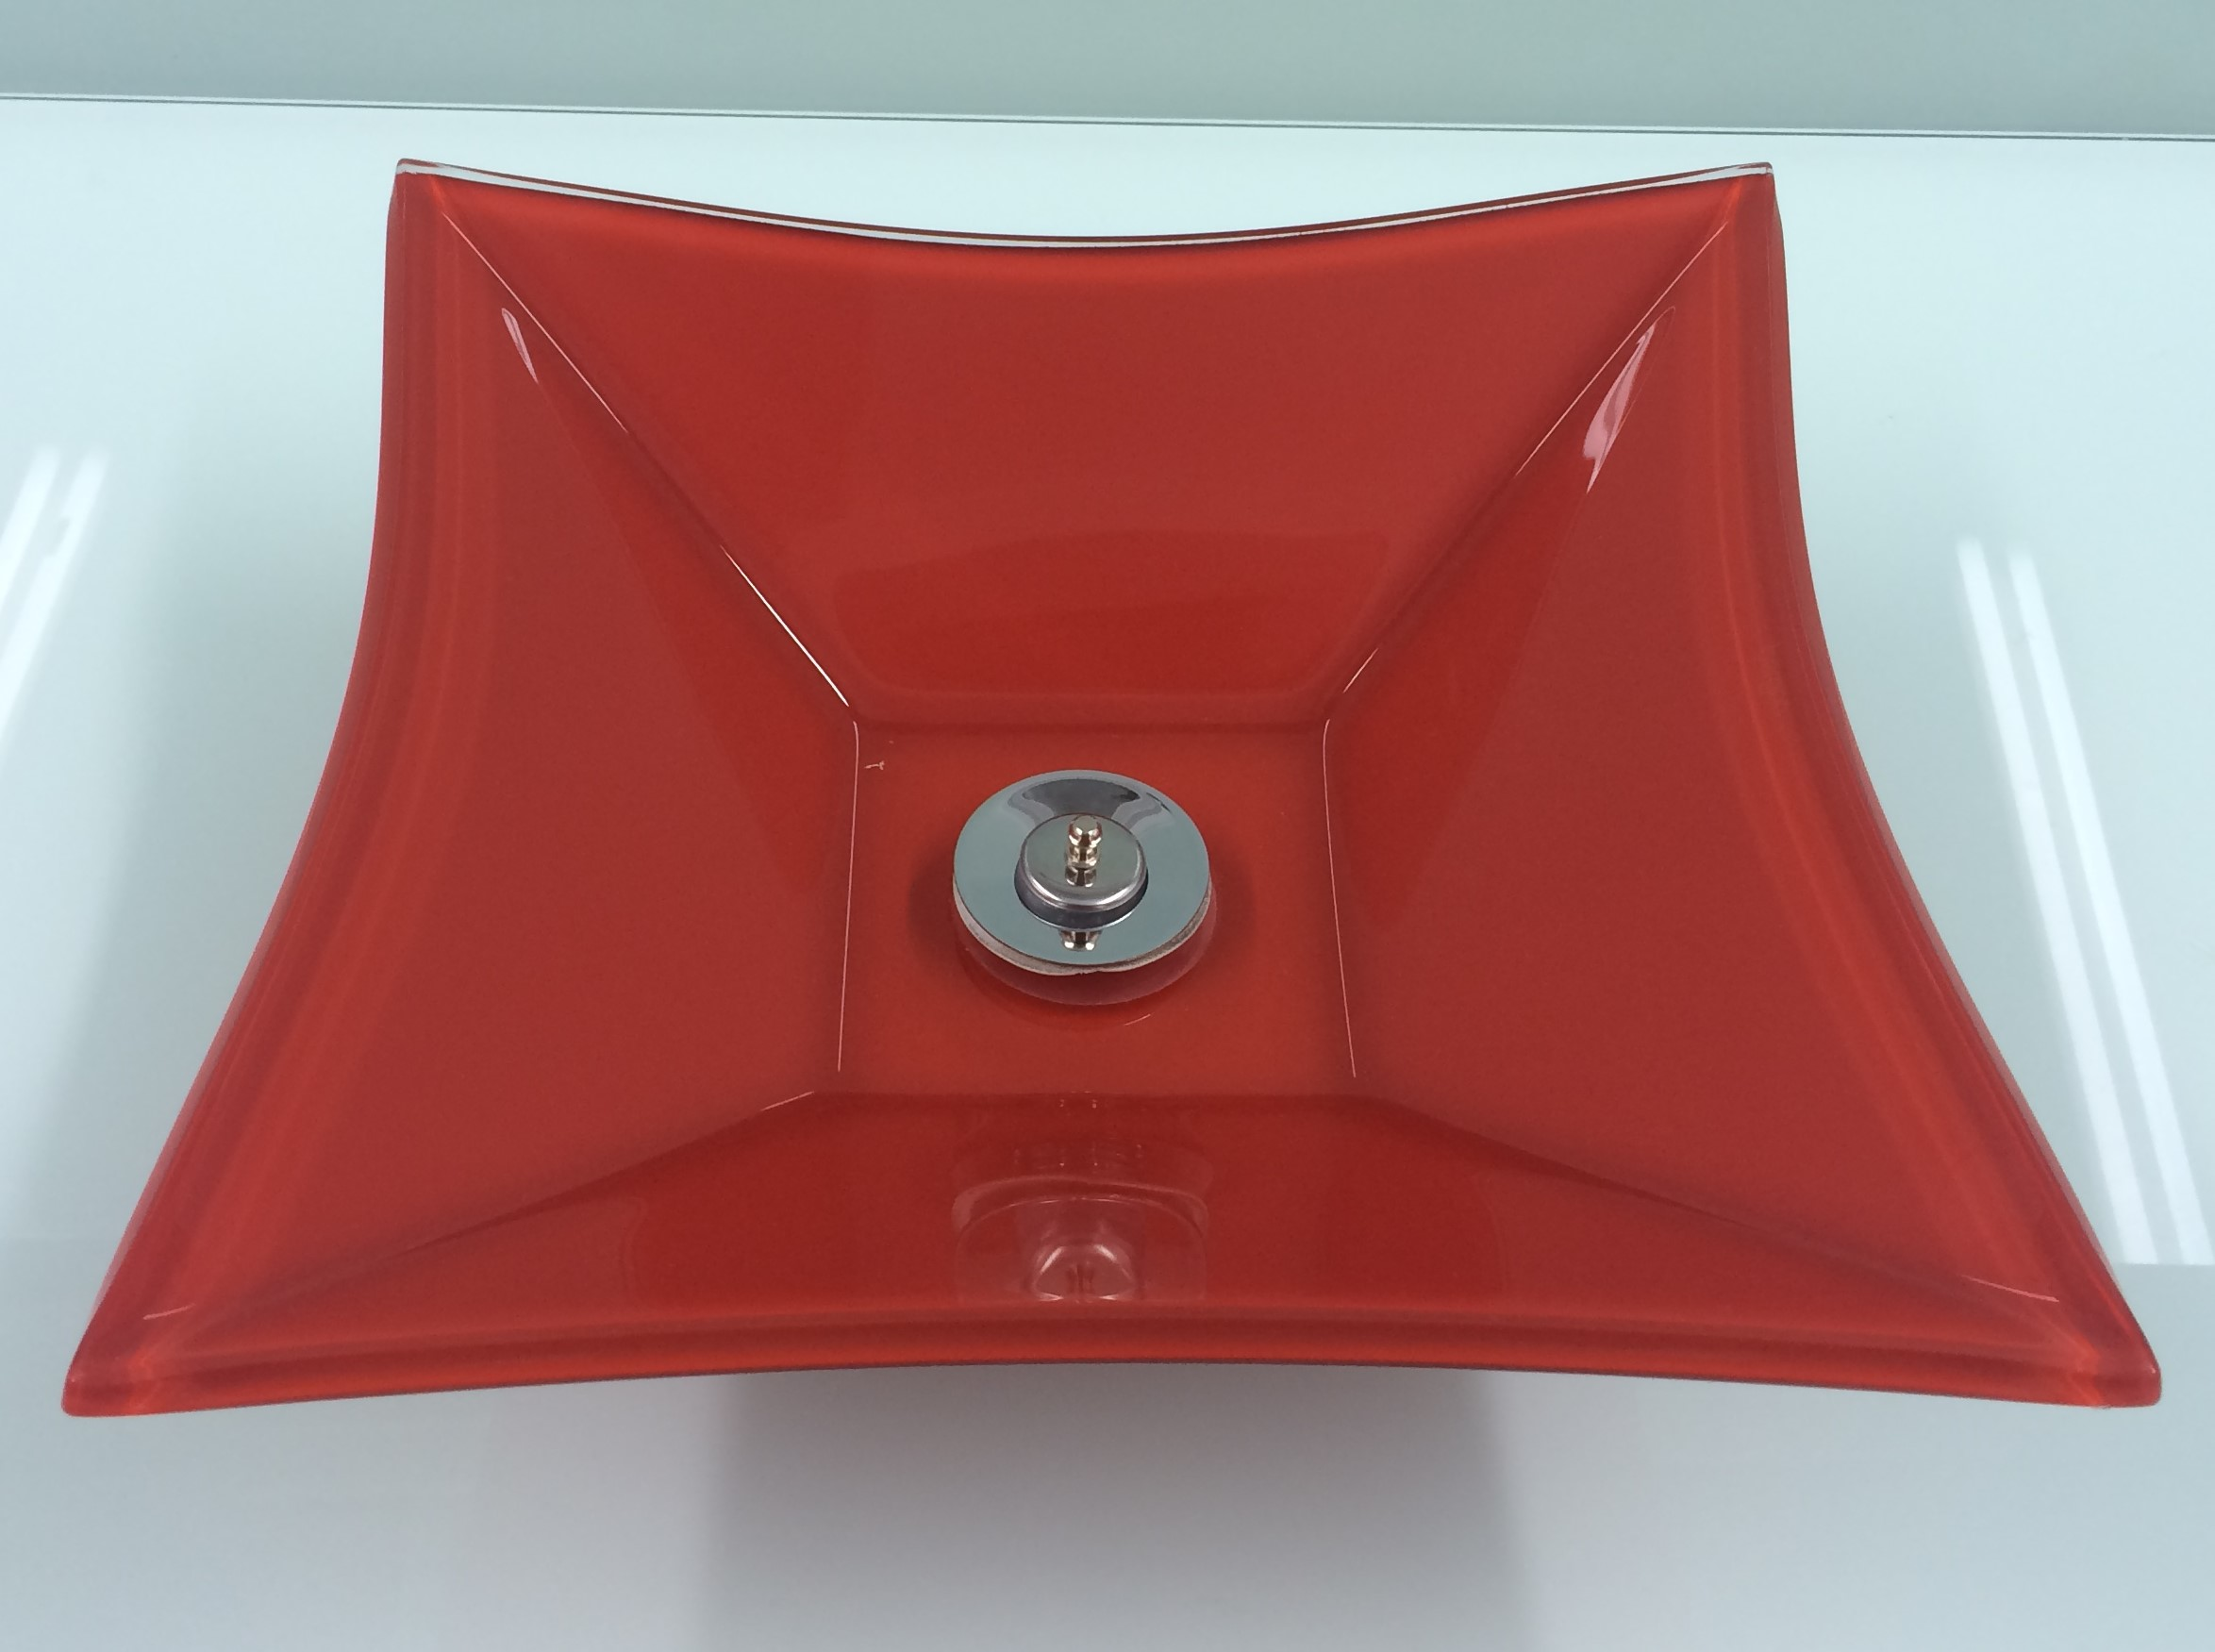 Cuba de Vidro Bergan - Sulle 34 x 34 cm 10 mm Vermelho